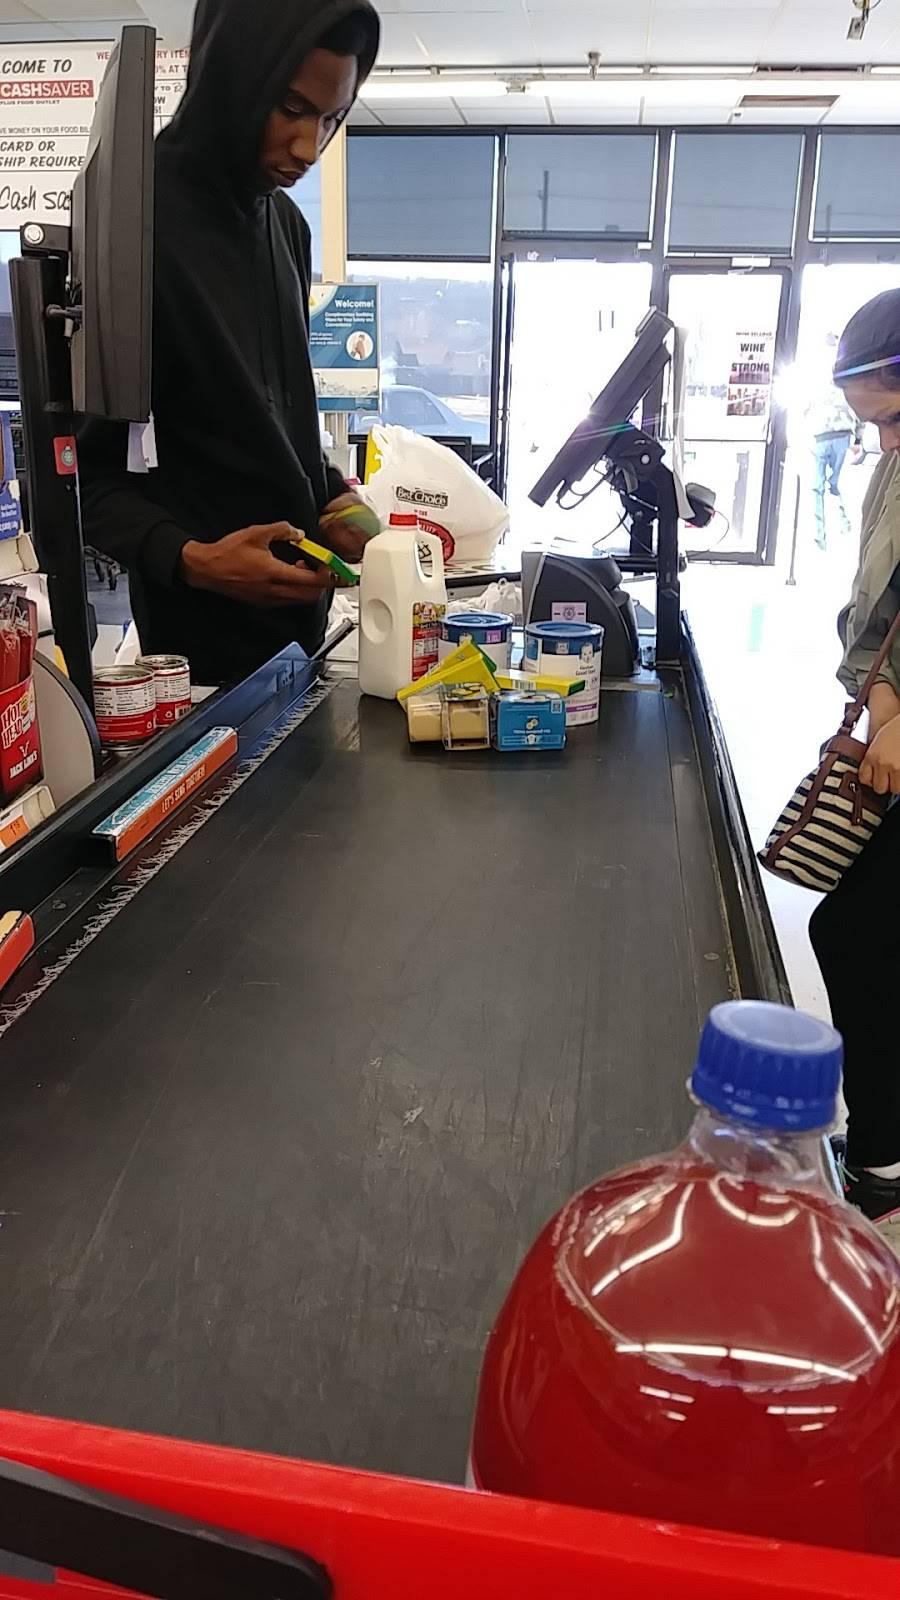 Cox Cash Saver Tulsa - supermarket  | Photo 10 of 10 | Address: 6207 S Peoria Ave, Tulsa, OK 74136, USA | Phone: (918) 749-4732